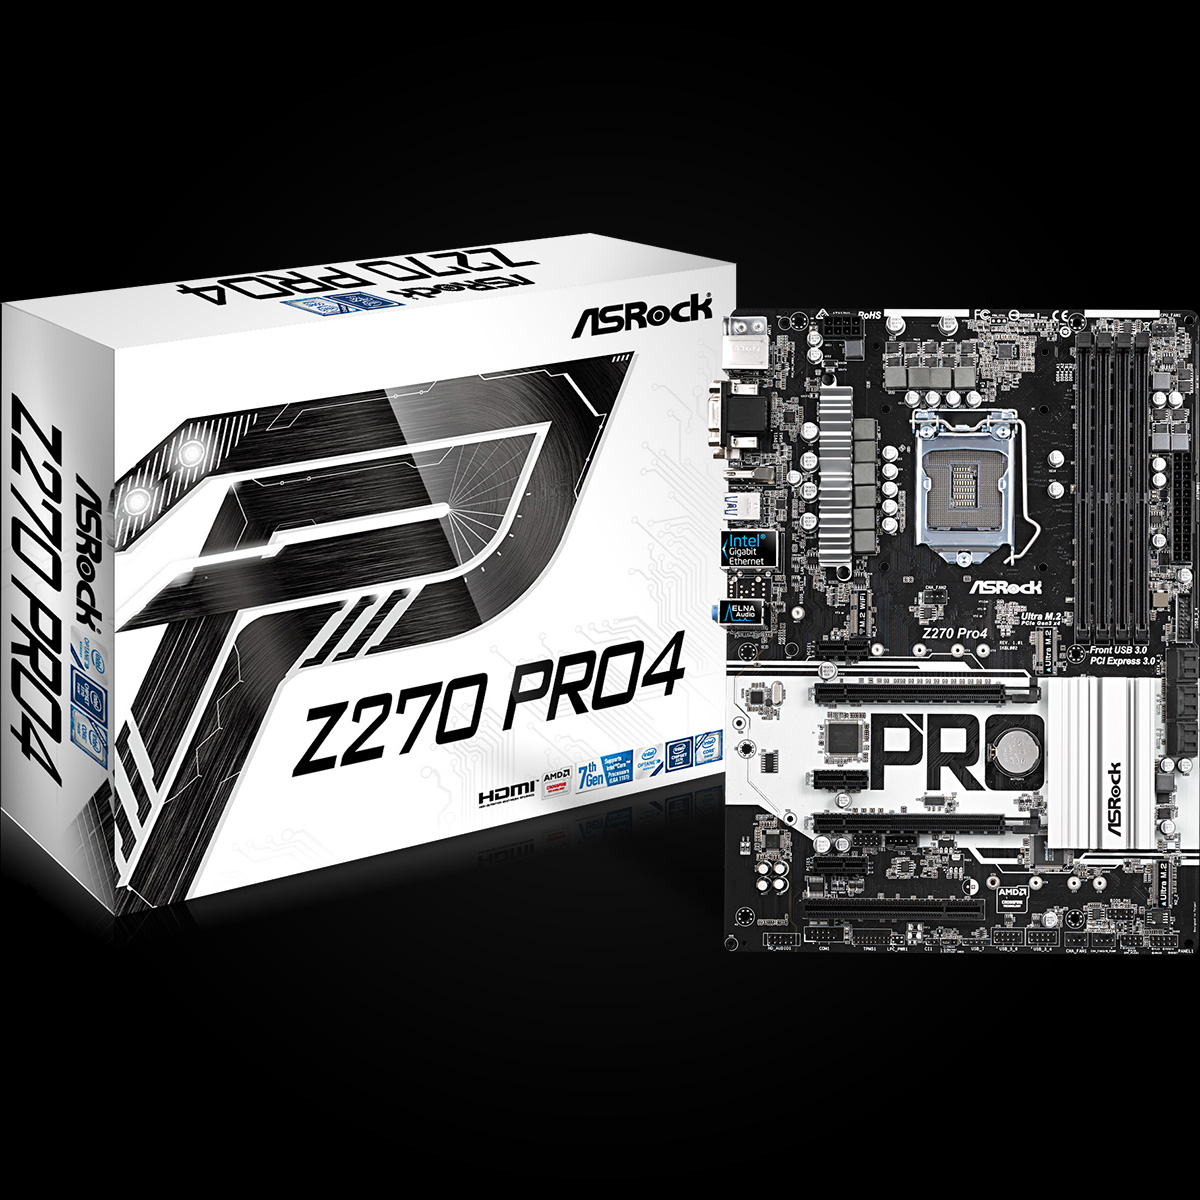 Asrock Z270 Pro4 Intel Z270 LGA1151 ATX motherboard